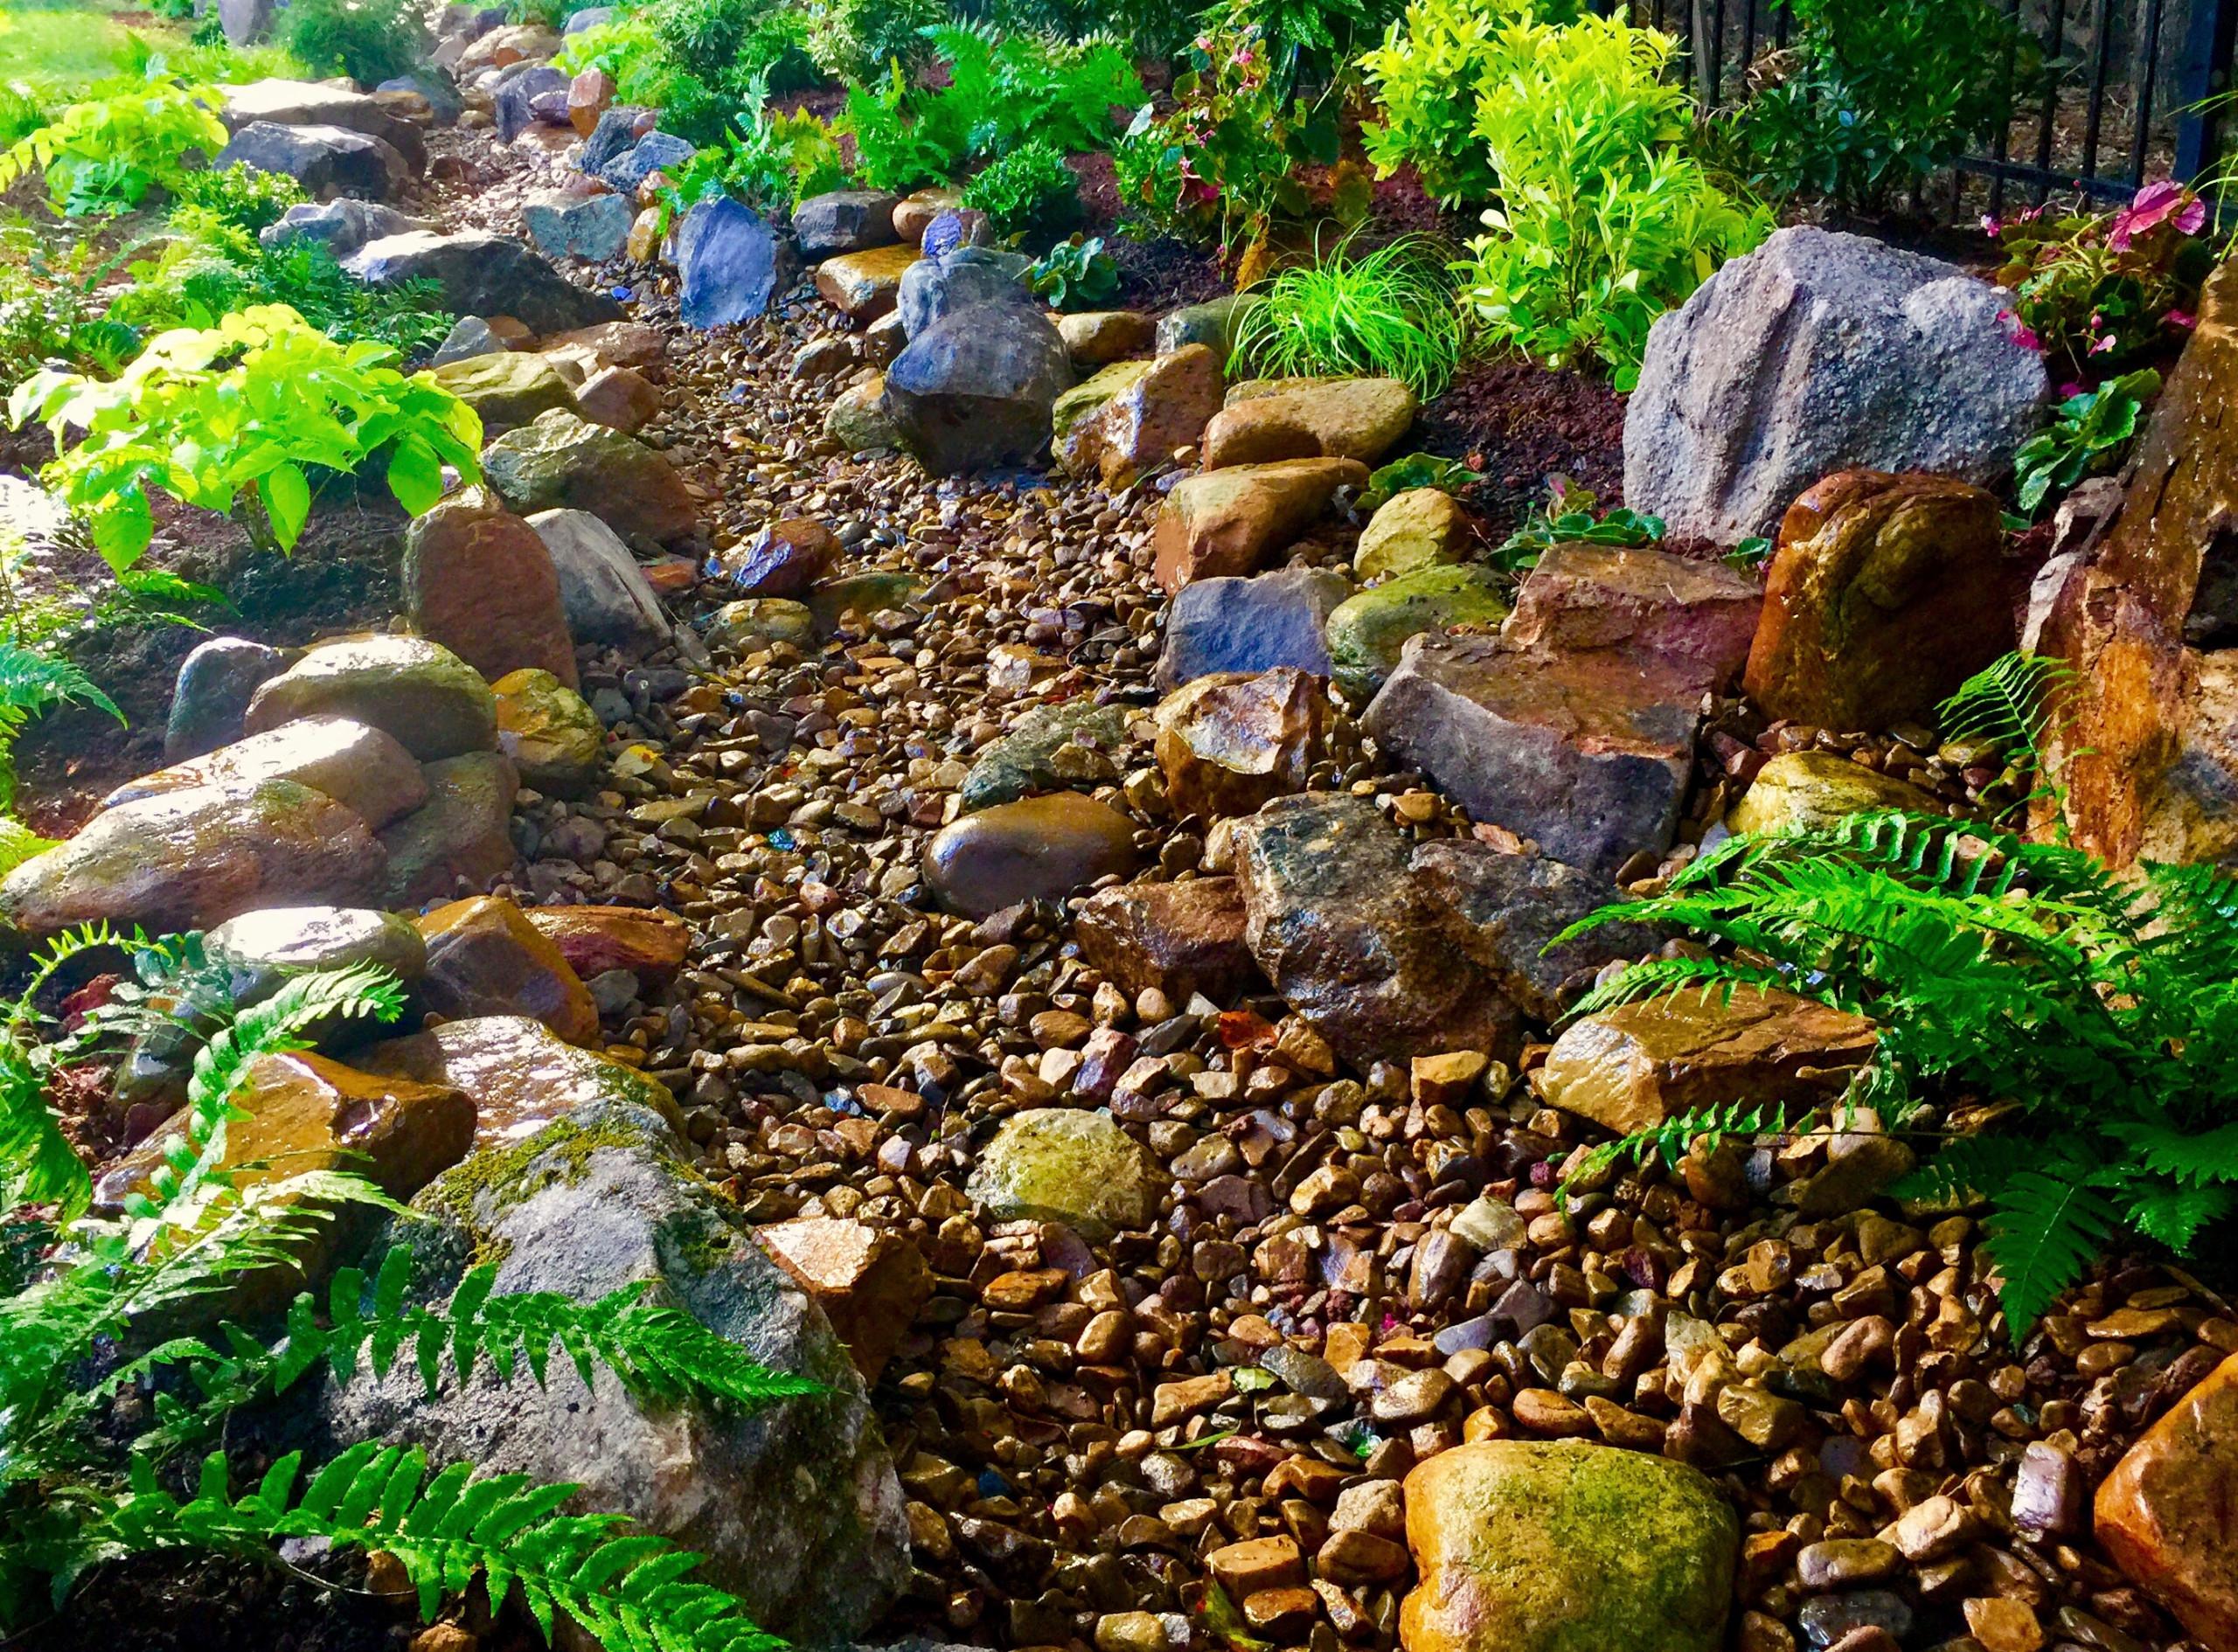 Davidson dry creek bed.